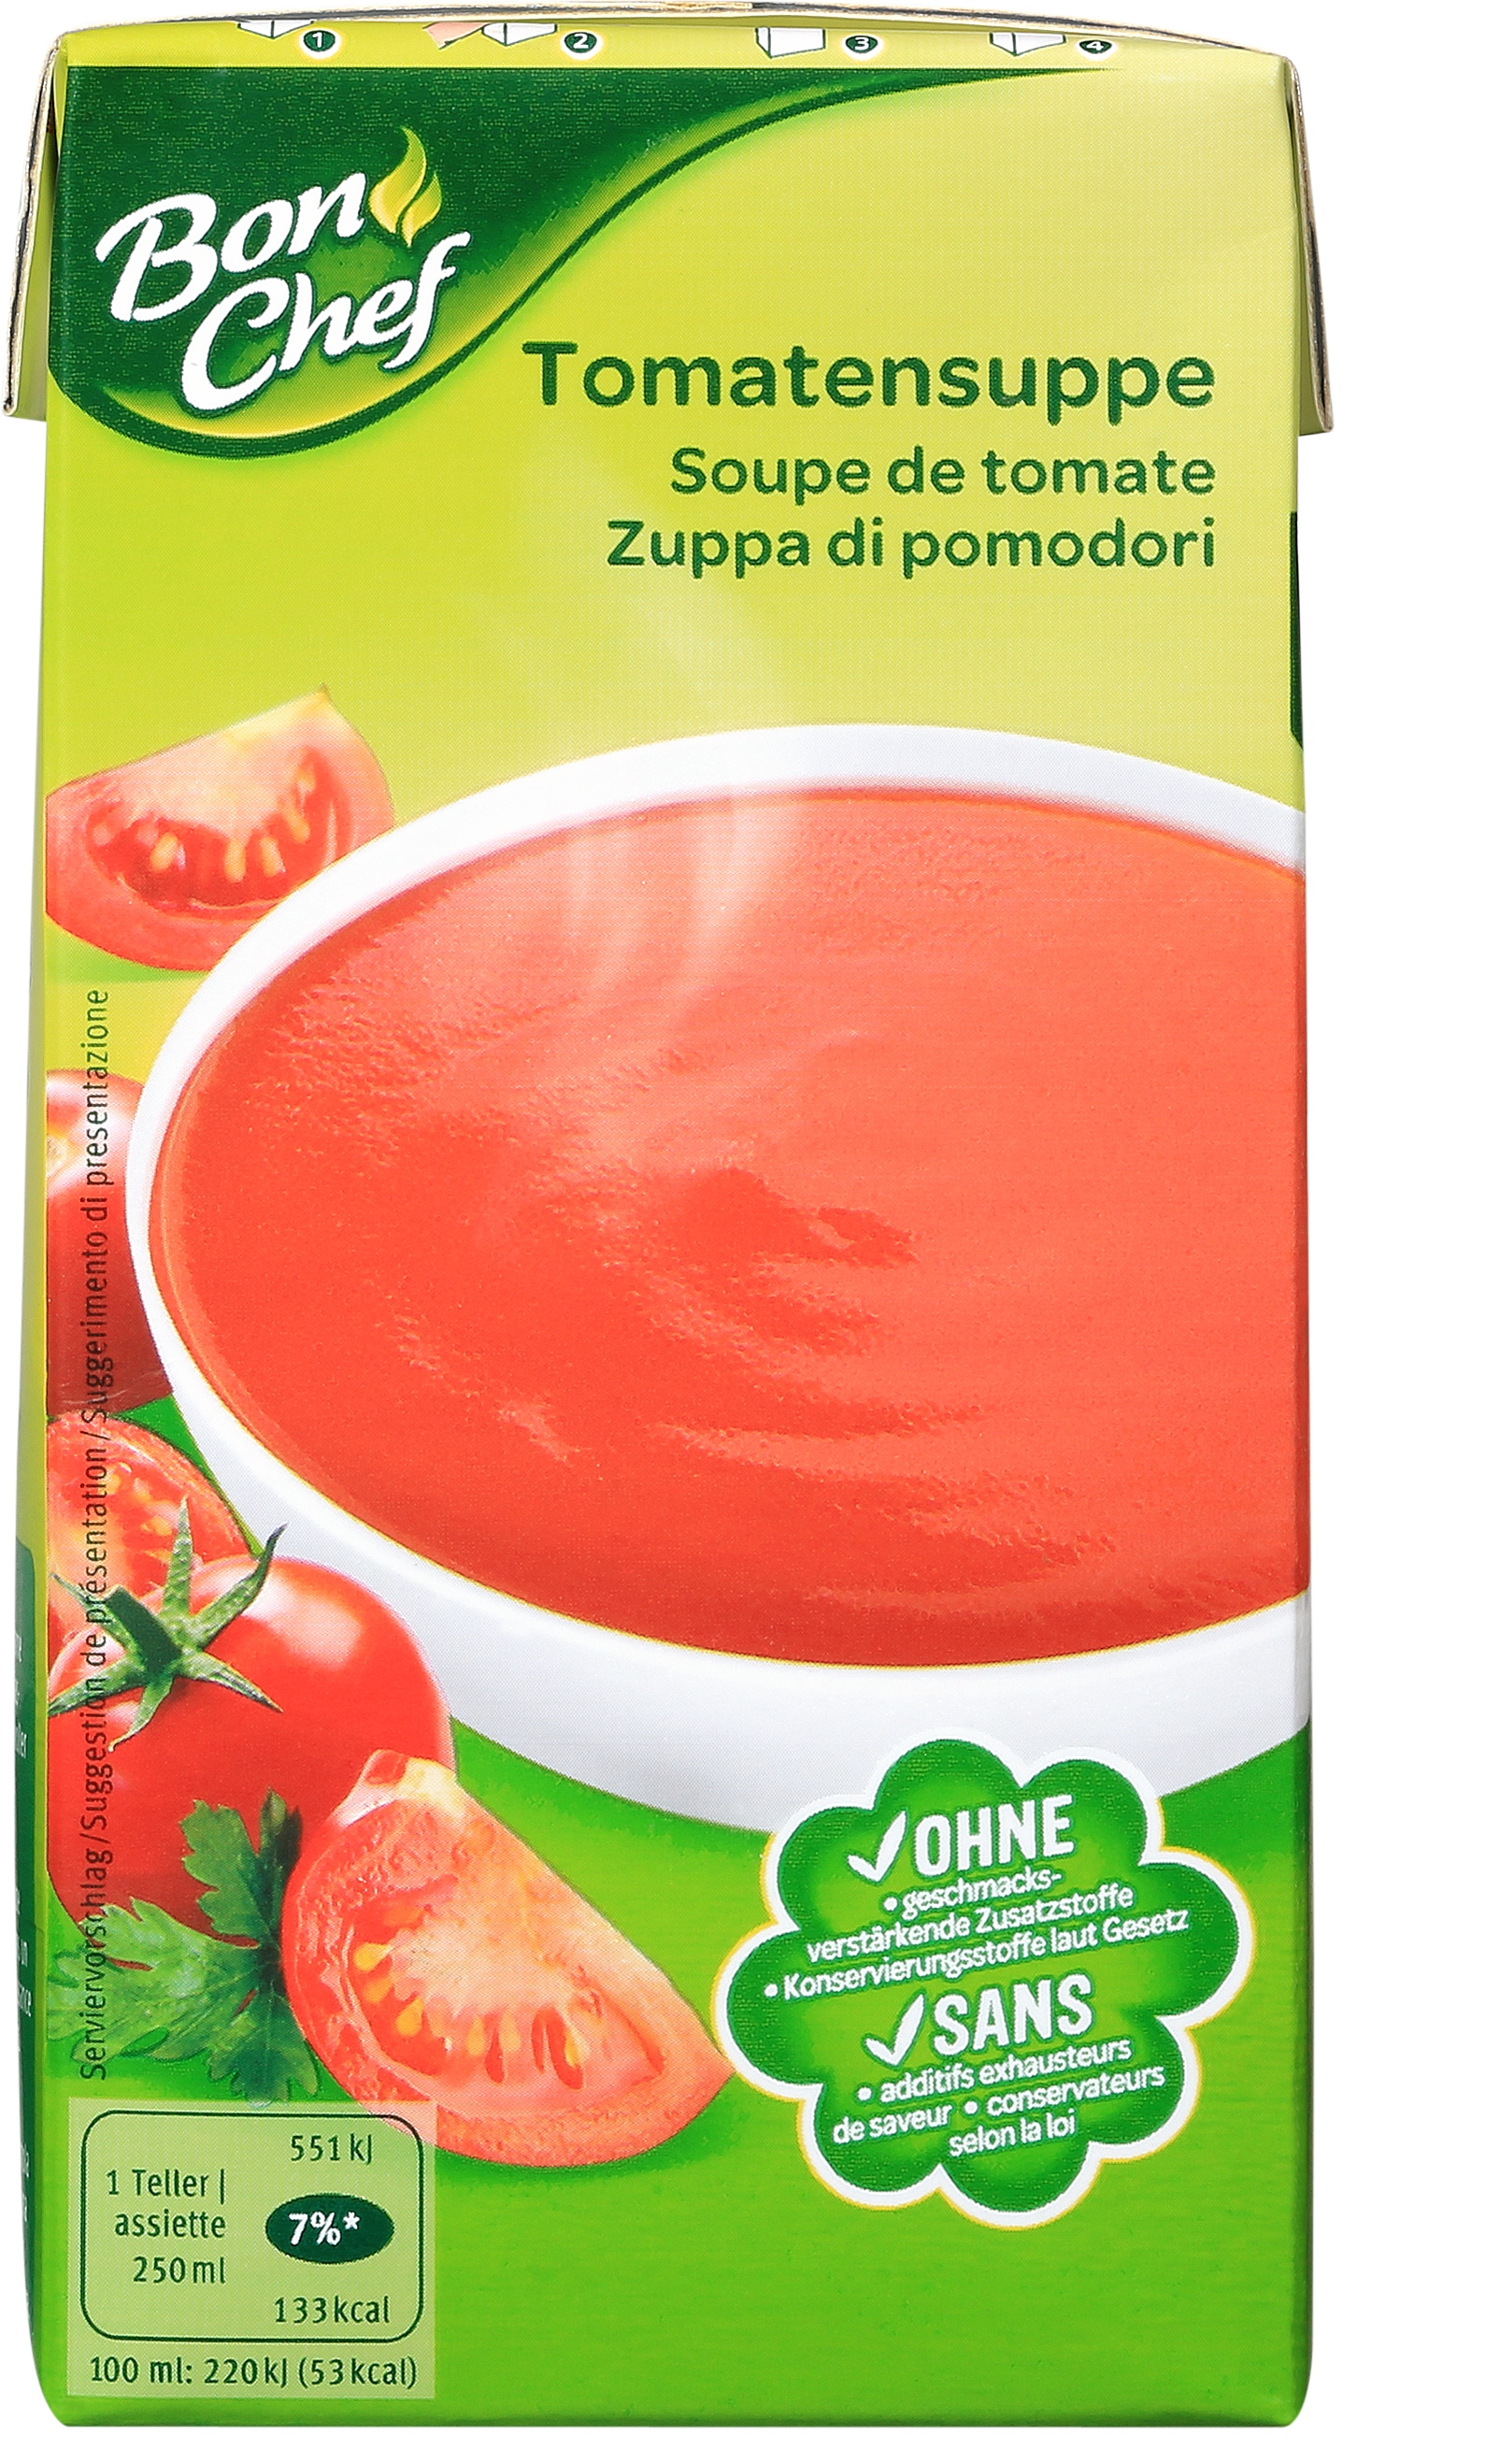 Bon Chef Tomatensuppe - 514g